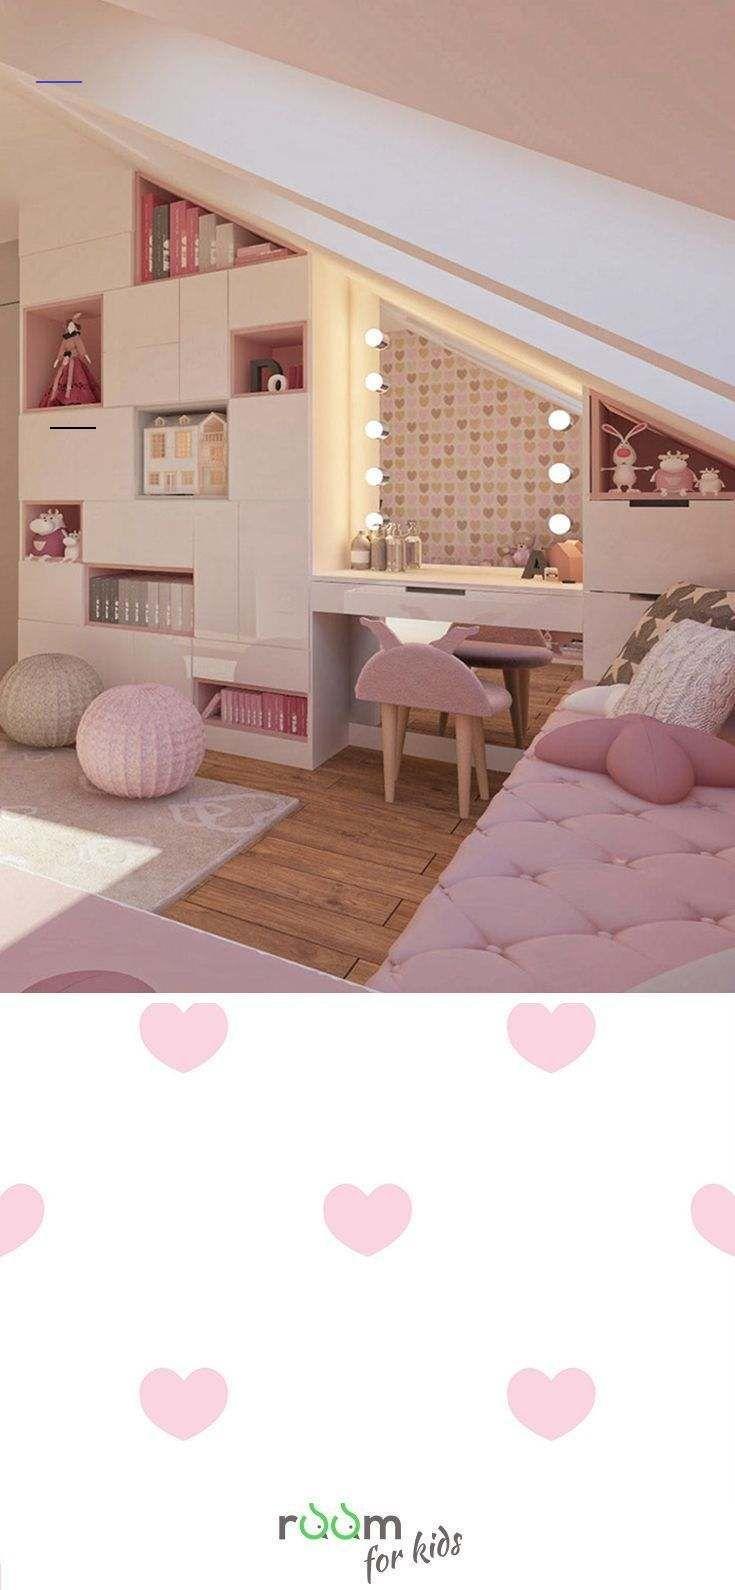 Gestaltungsidee Fur Ein Madchenzimmer Im Rosa Design Wallniches Ein Madchentraum Im Rosa De En 2021 Chambre Enfant Idee Deco Chambre Ado Fille Idee Chambre Enfant